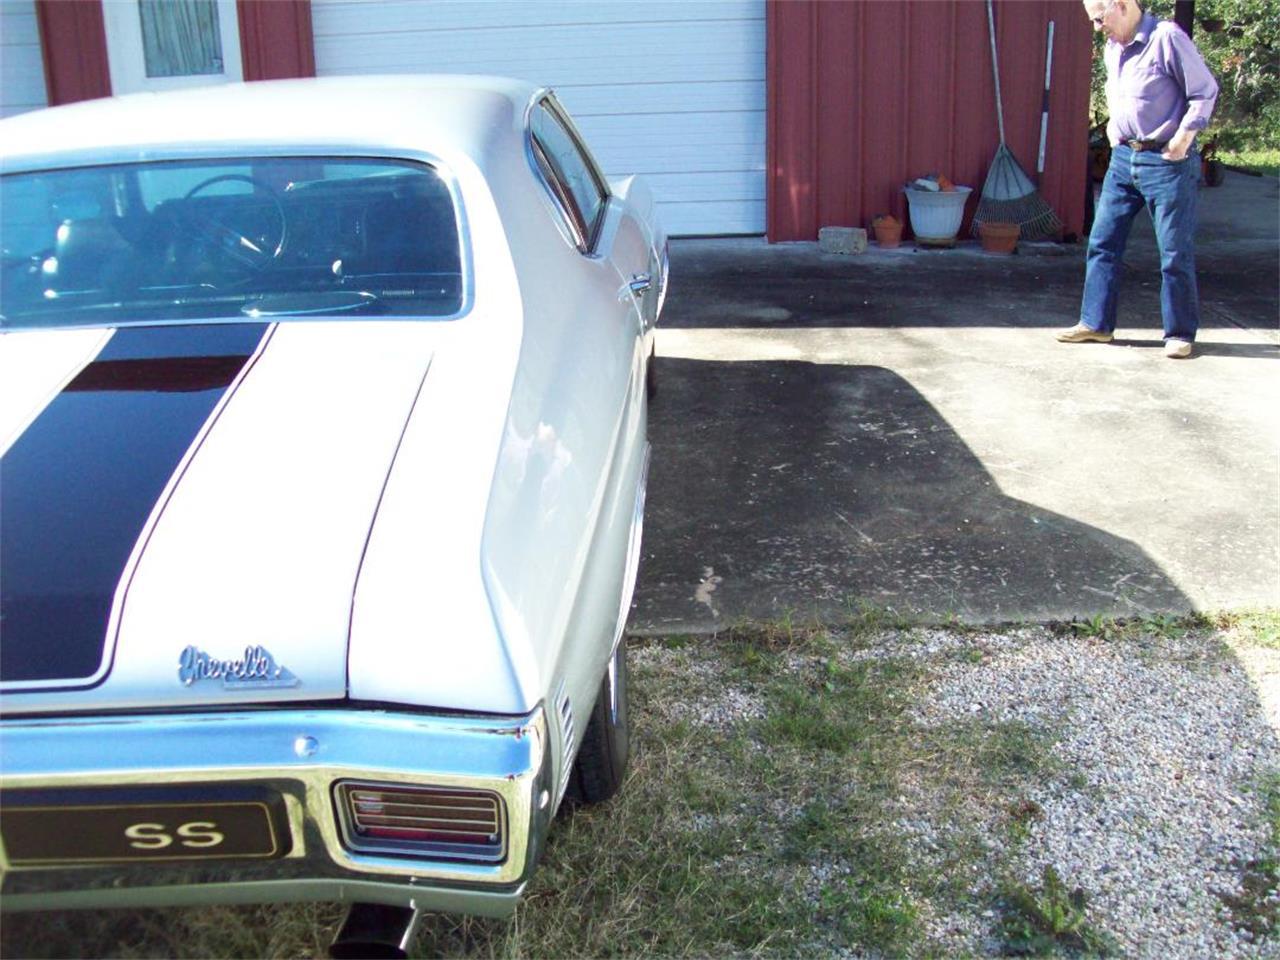 1970 Chevrolet Chevelle SS (CC-1317172) for sale in Edna, Texas